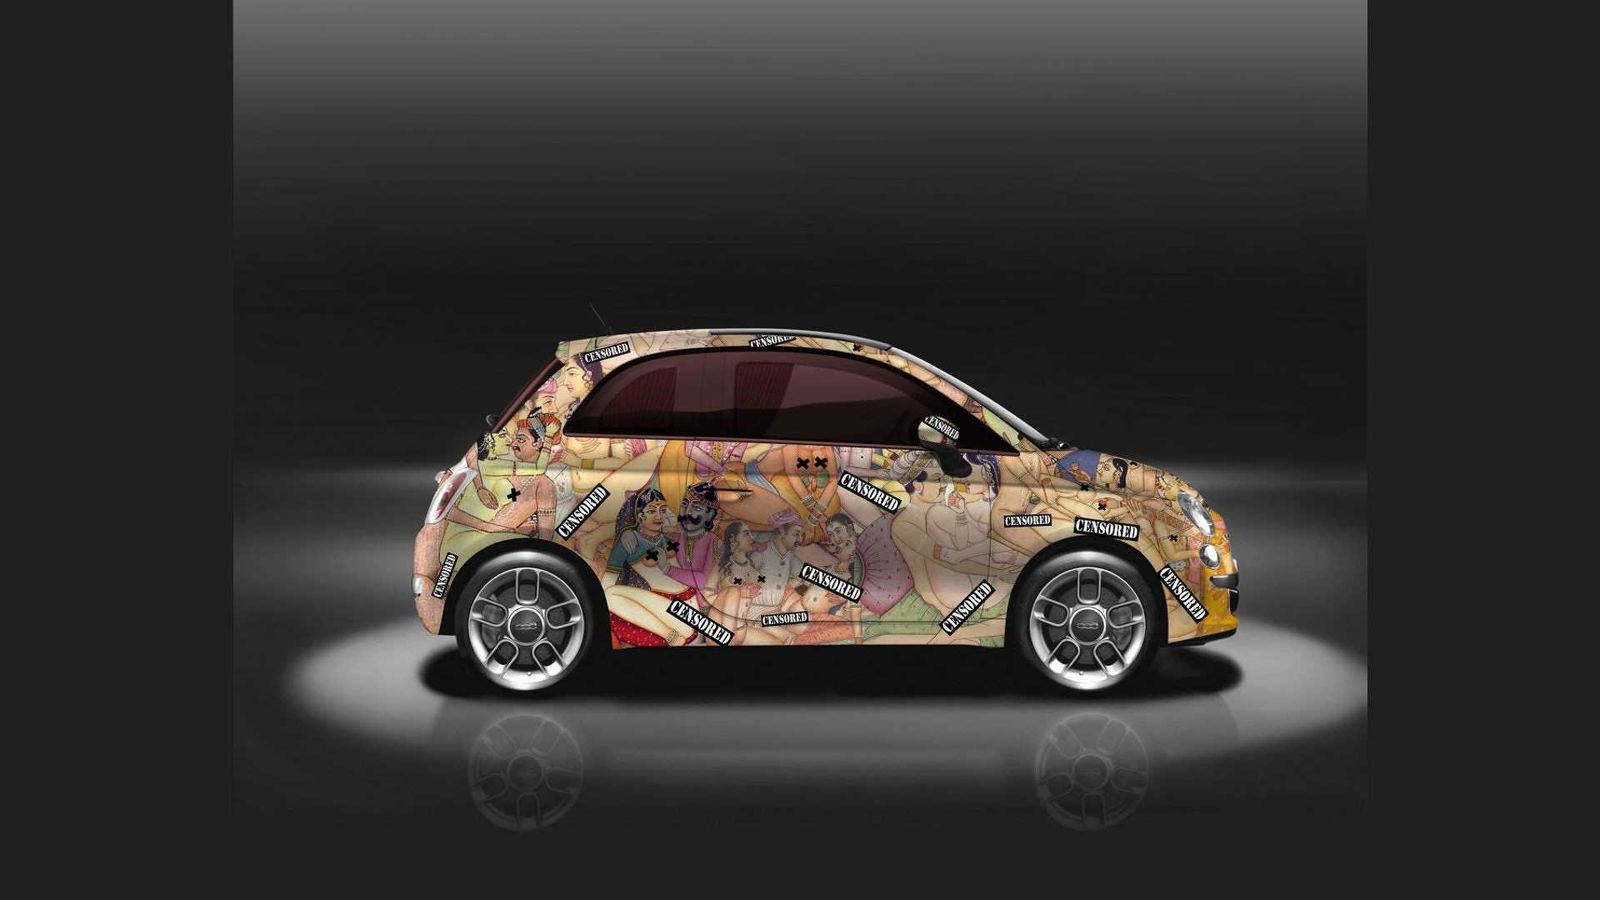 Fiat 500 kama sutra fiat 500 for Fiat 500 karmasutra